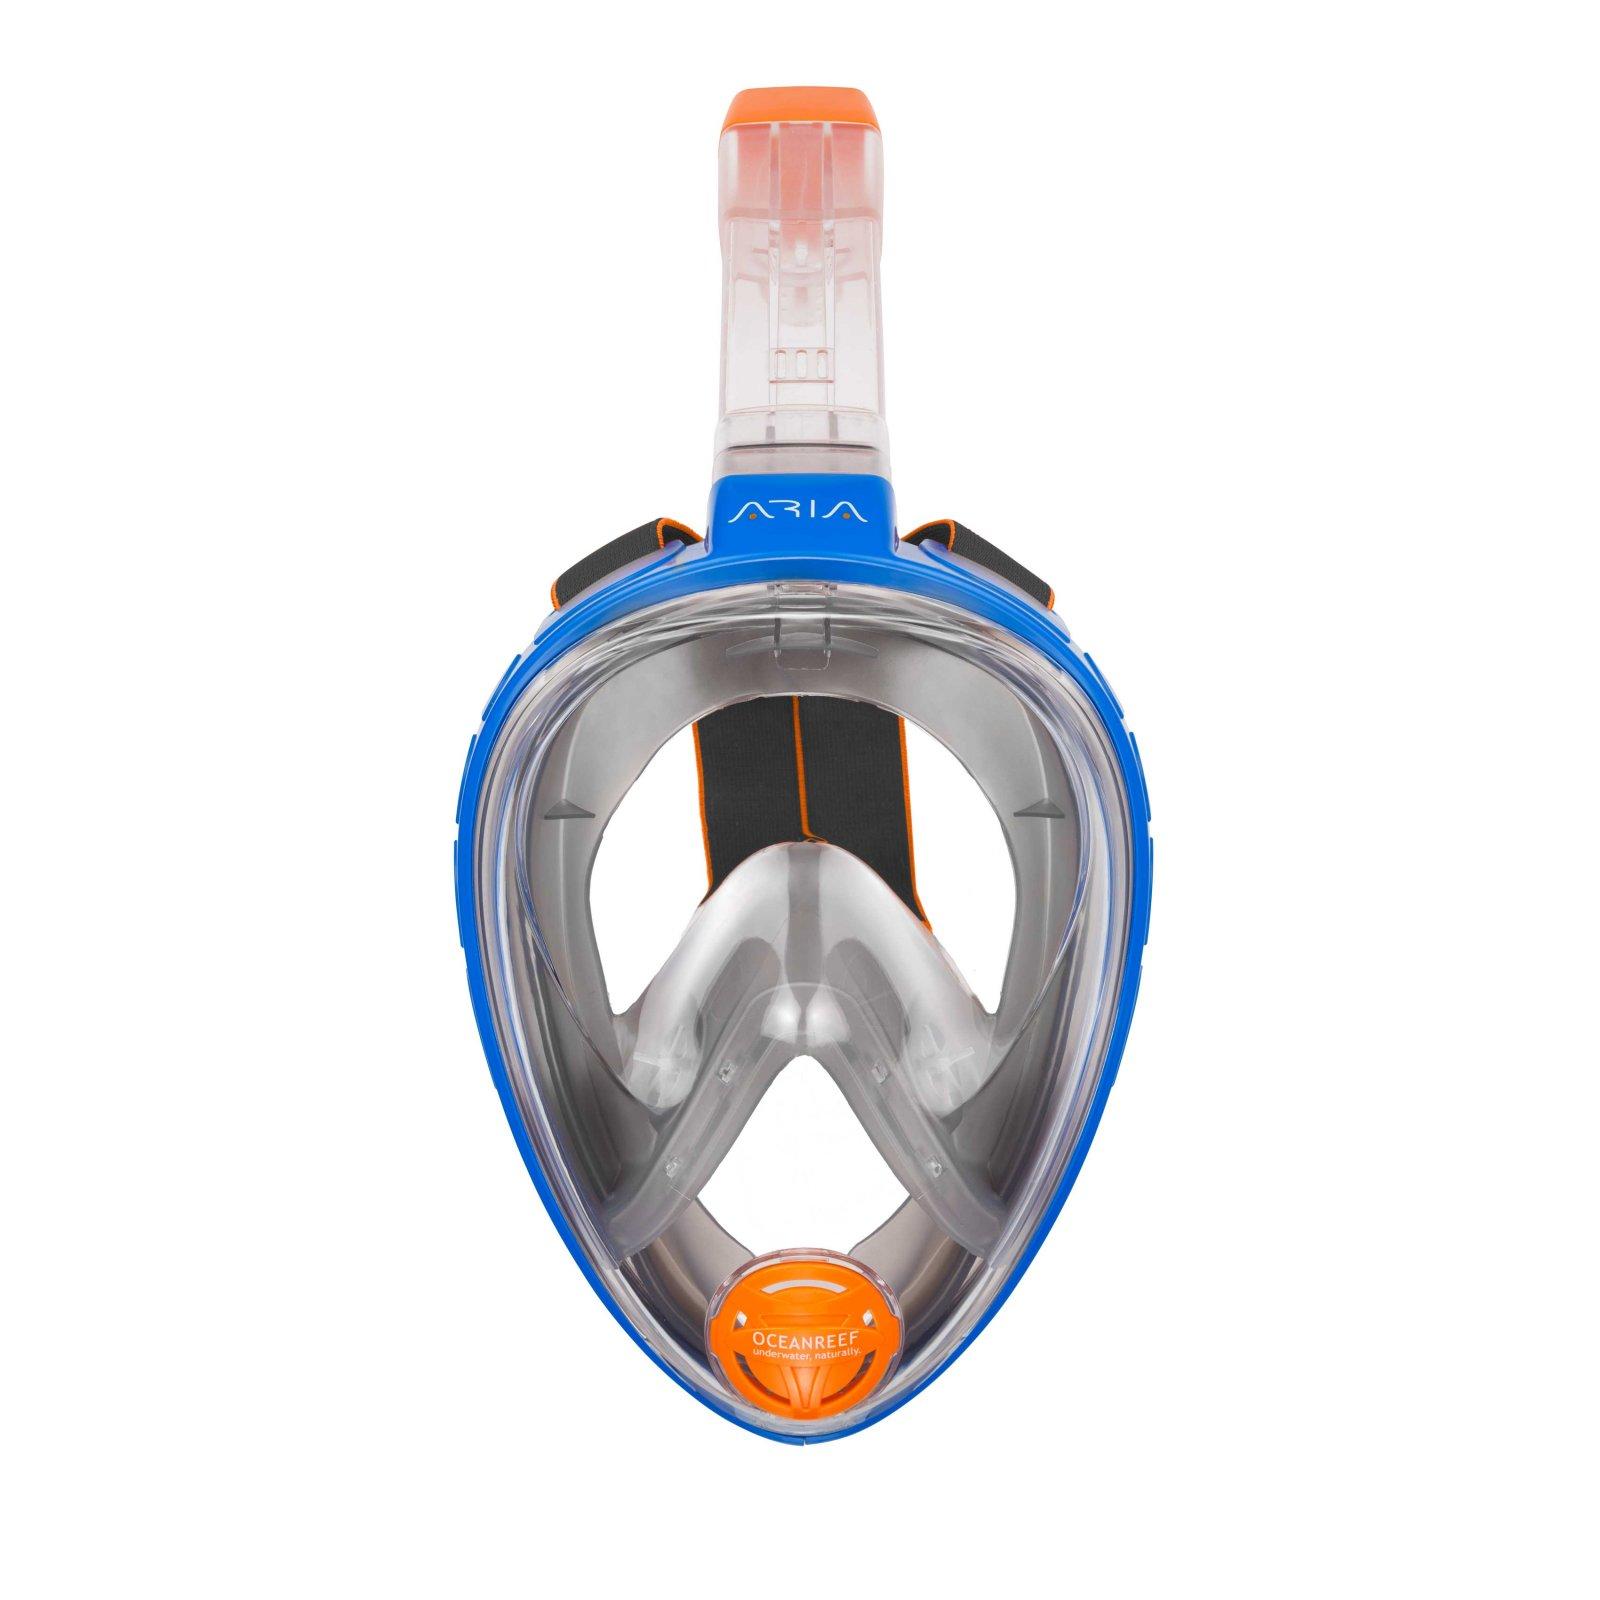 Aria Classic Full Face Mask